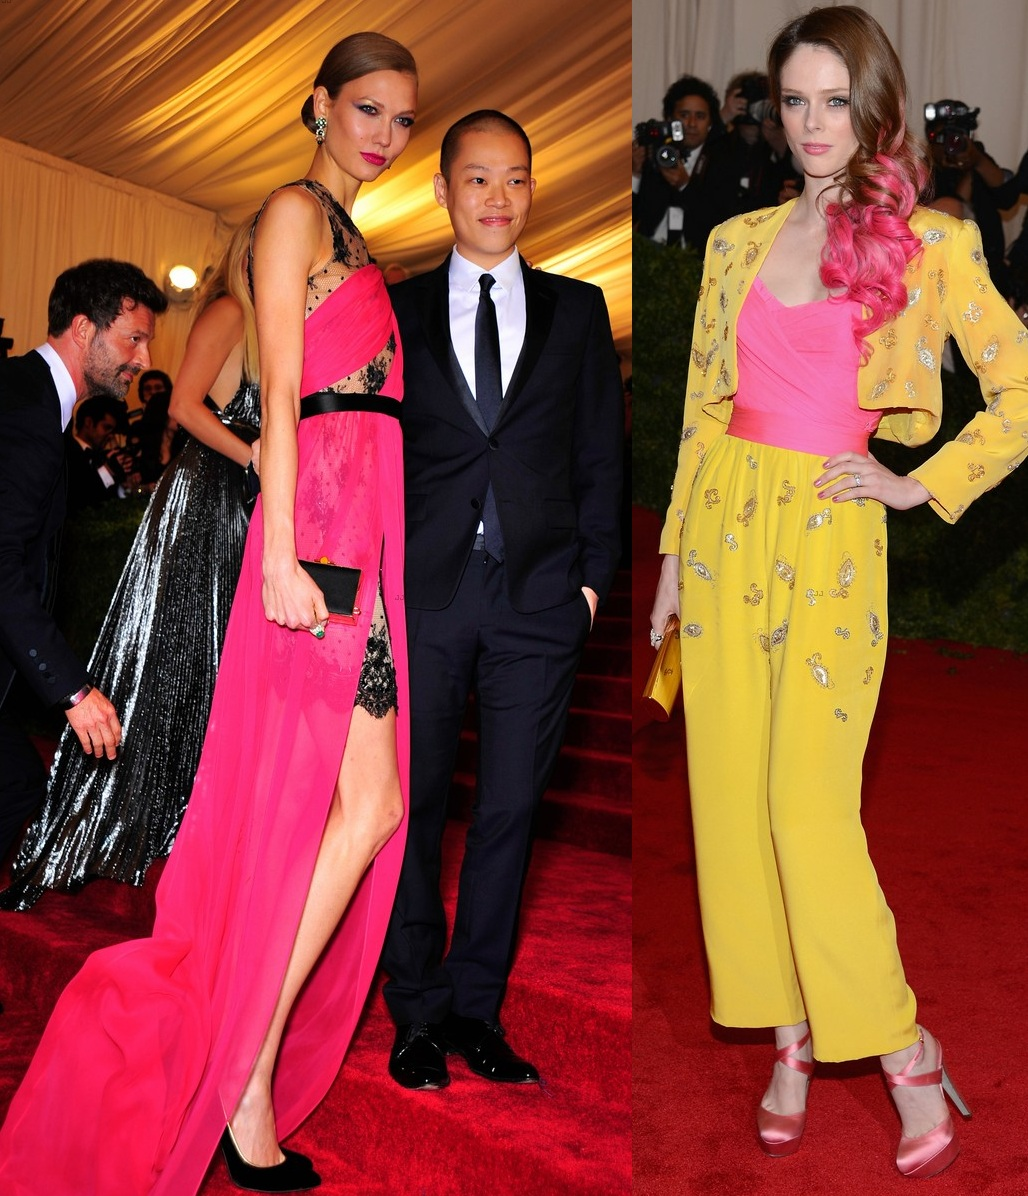 http://2.bp.blogspot.com/-LcqWzyyOA8k/T6rUwQagTtI/AAAAAAAAIyU/TVX-DEGYVCI/s1600/Karlie+Kloss+in+Jason+Wu+and+Coco+Rocha+in+Givenchy.JPG